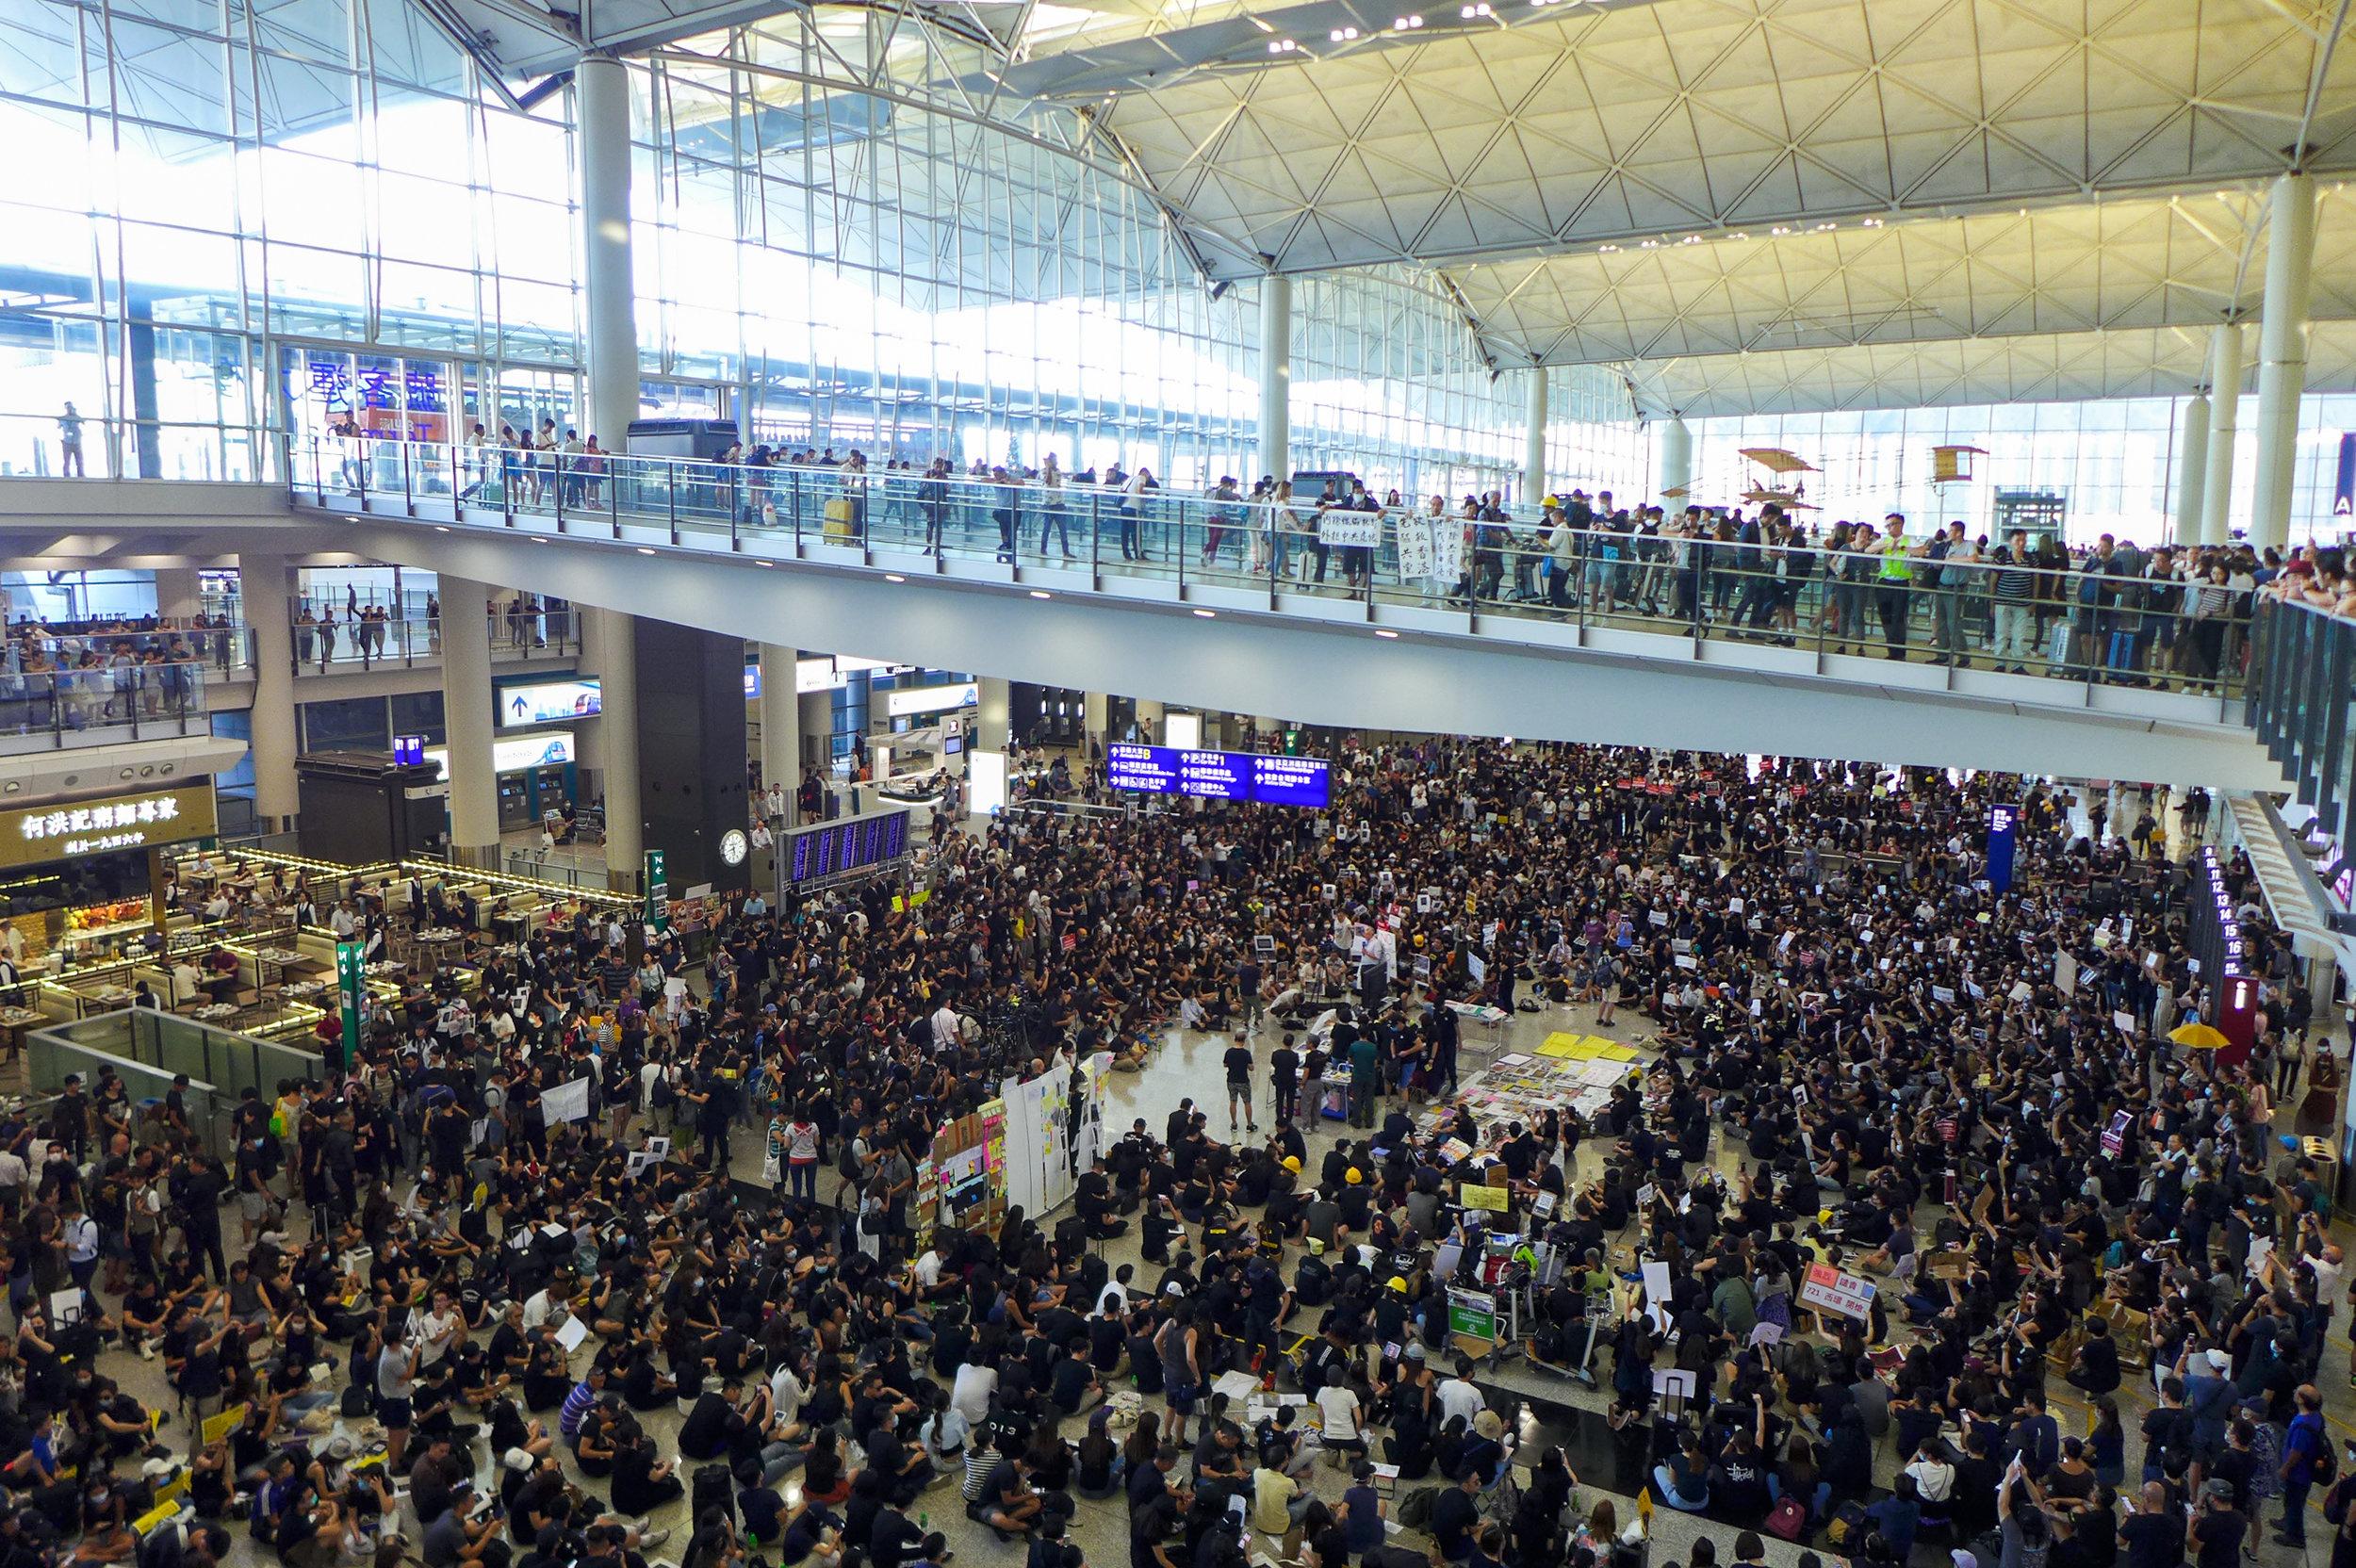 HK_airport_sit-in_protest_20190726.jpg